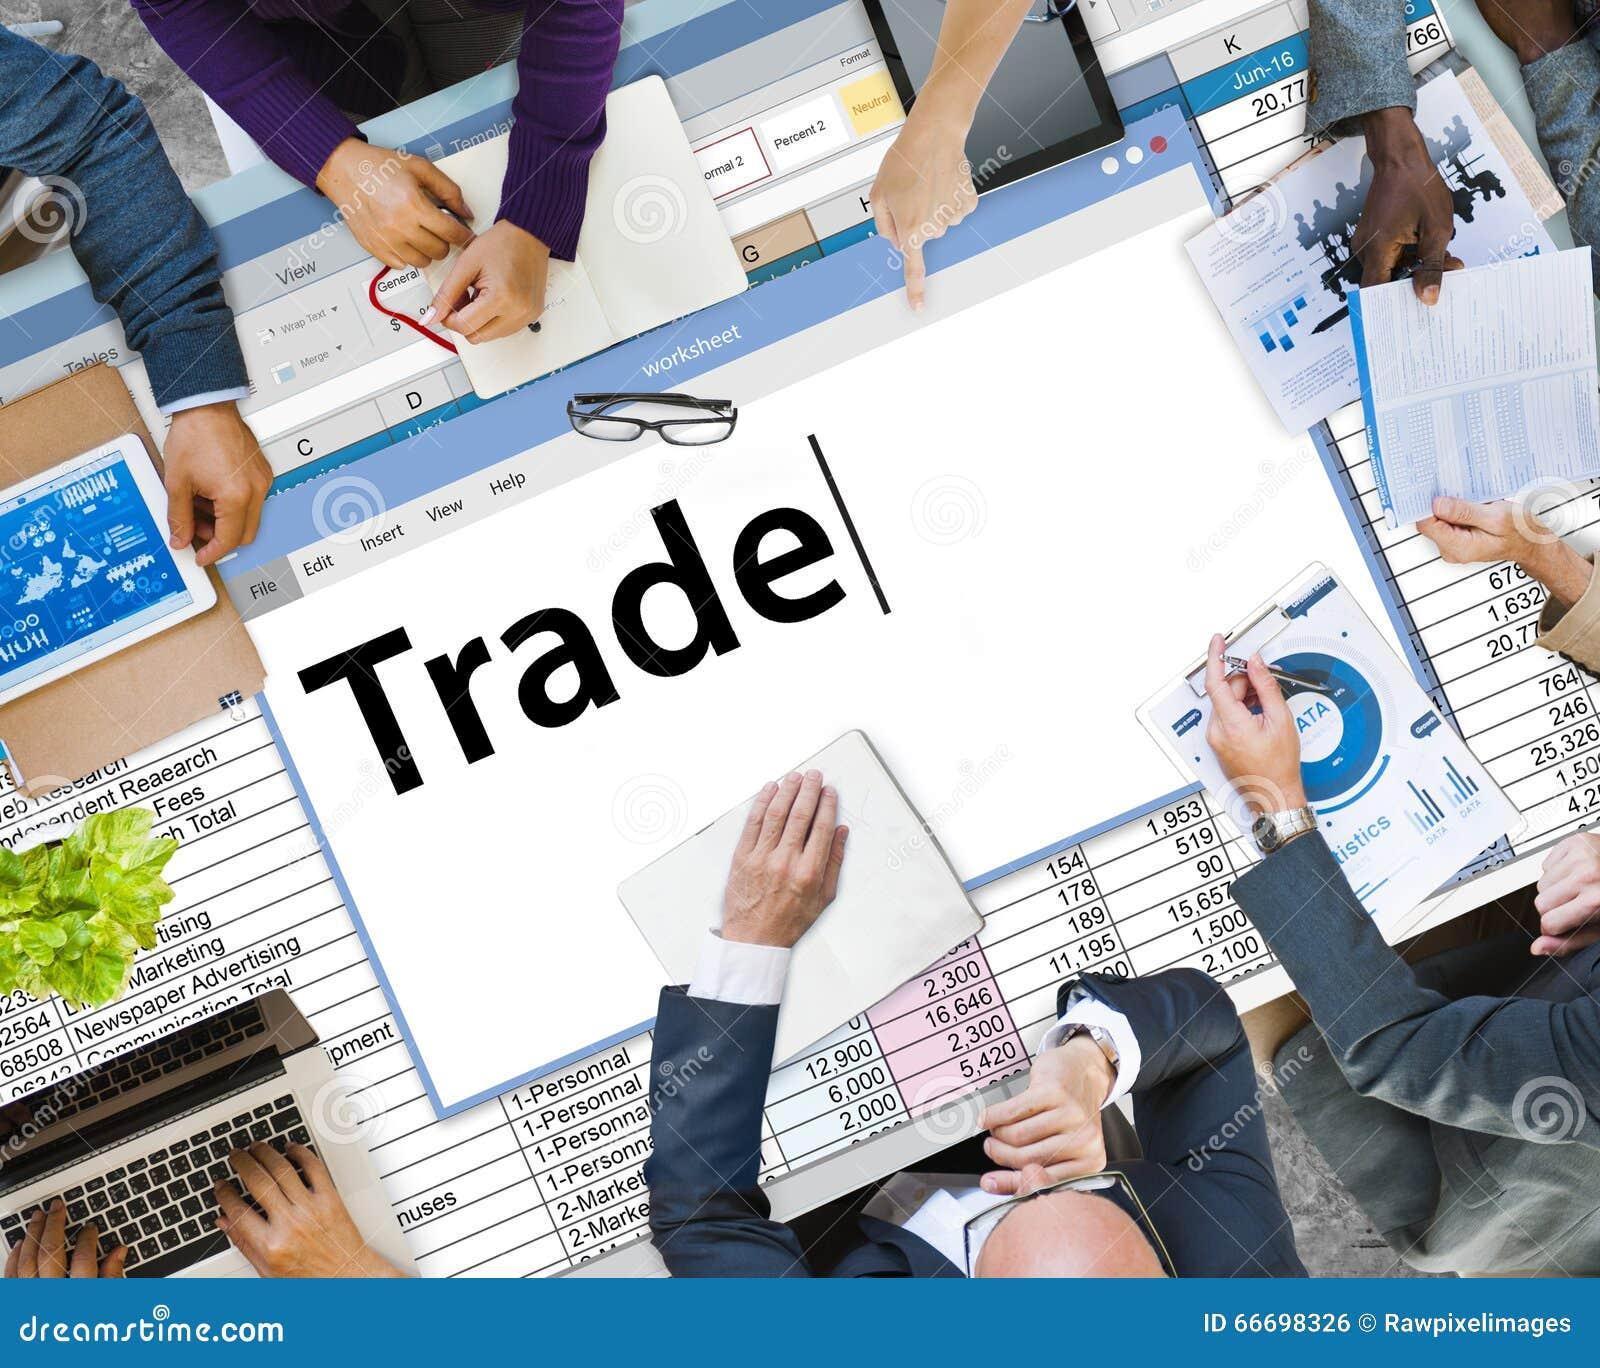 Exchange trade